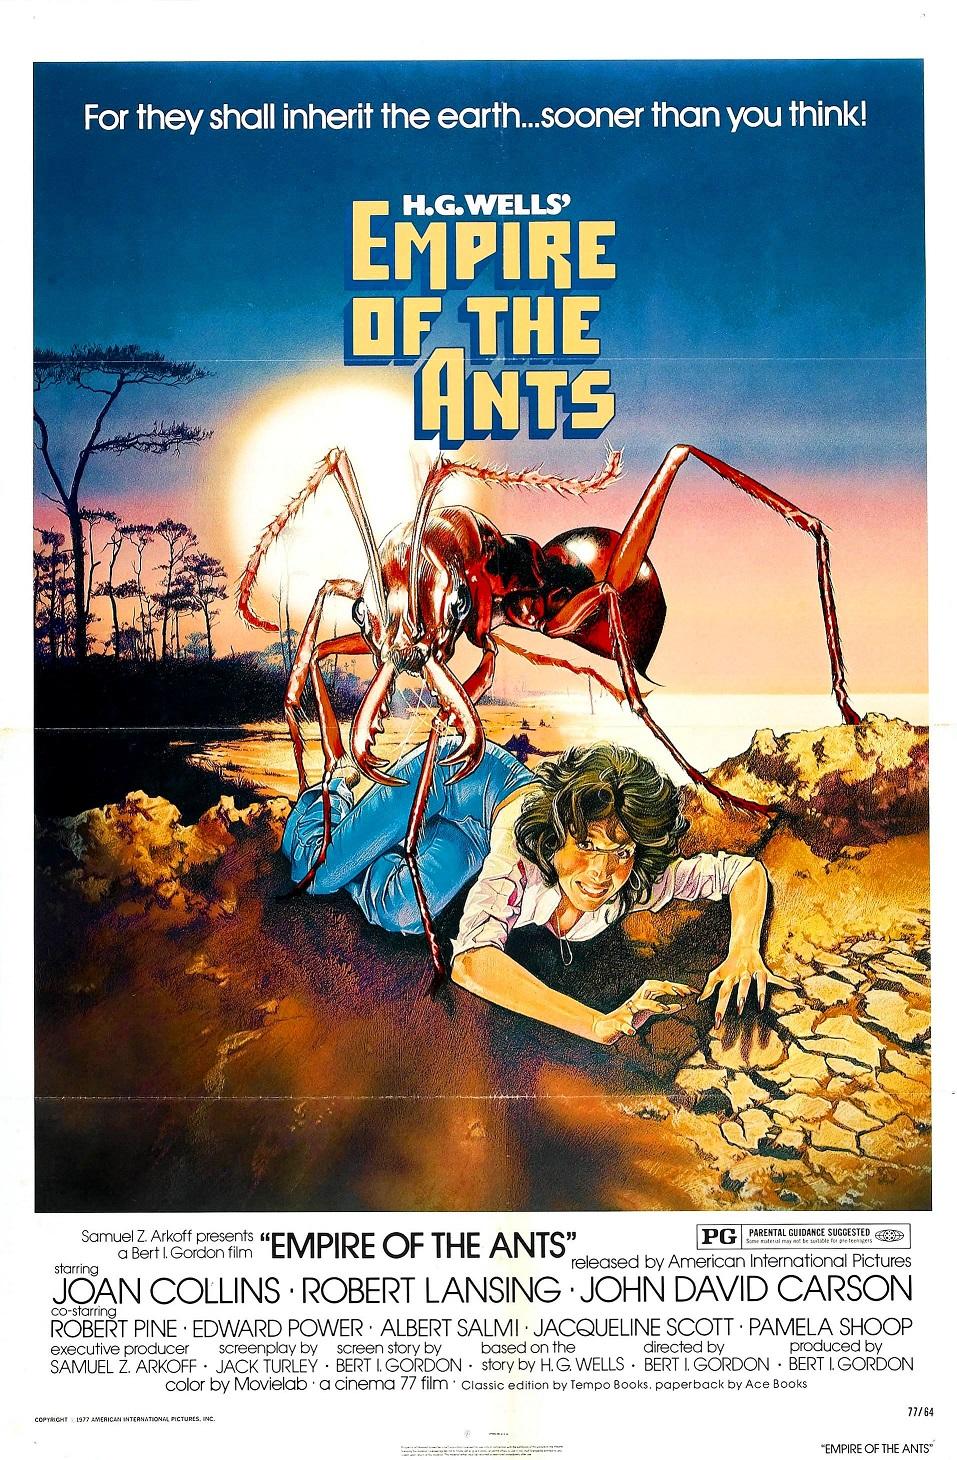 empire-of-the-ants-1kite44empire-of-the-ants-1empire-of-the-ants-29empire-of-the-ants-20empire-of-the-ants-5